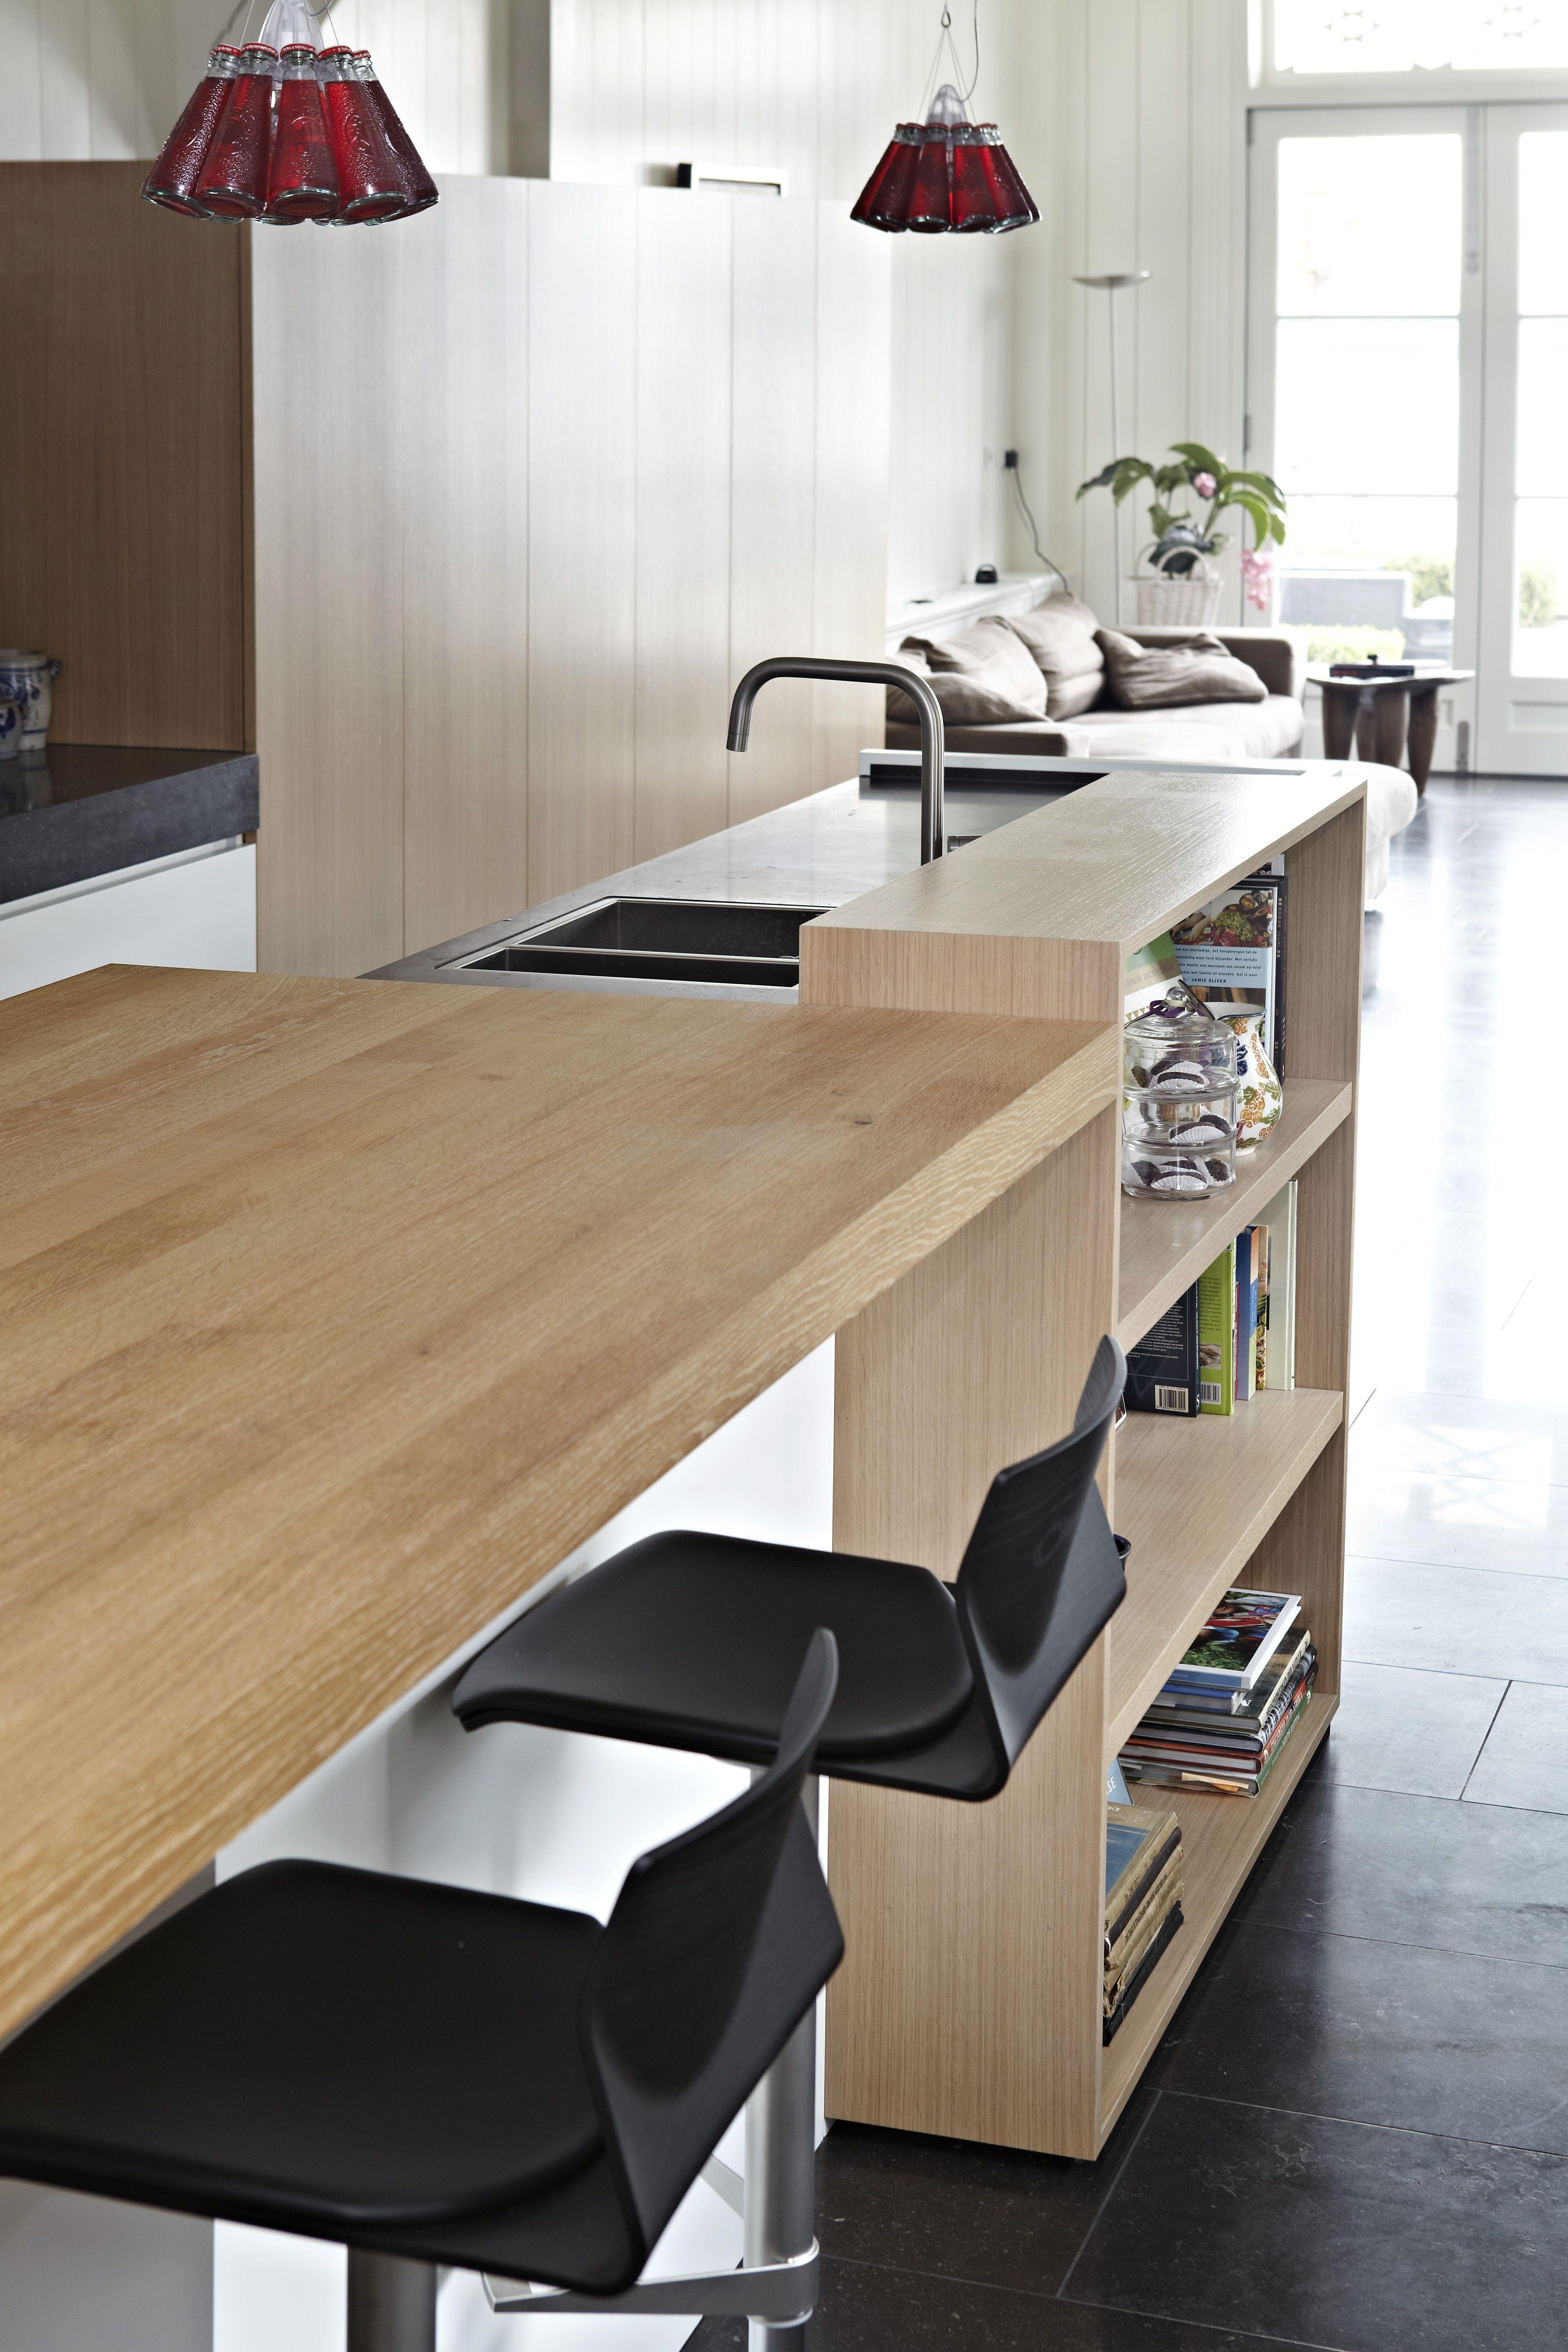 keuken tegels landelijke stijl : Keuken Balken Plafond Eiken Hout Landelijke Stijl Tegel